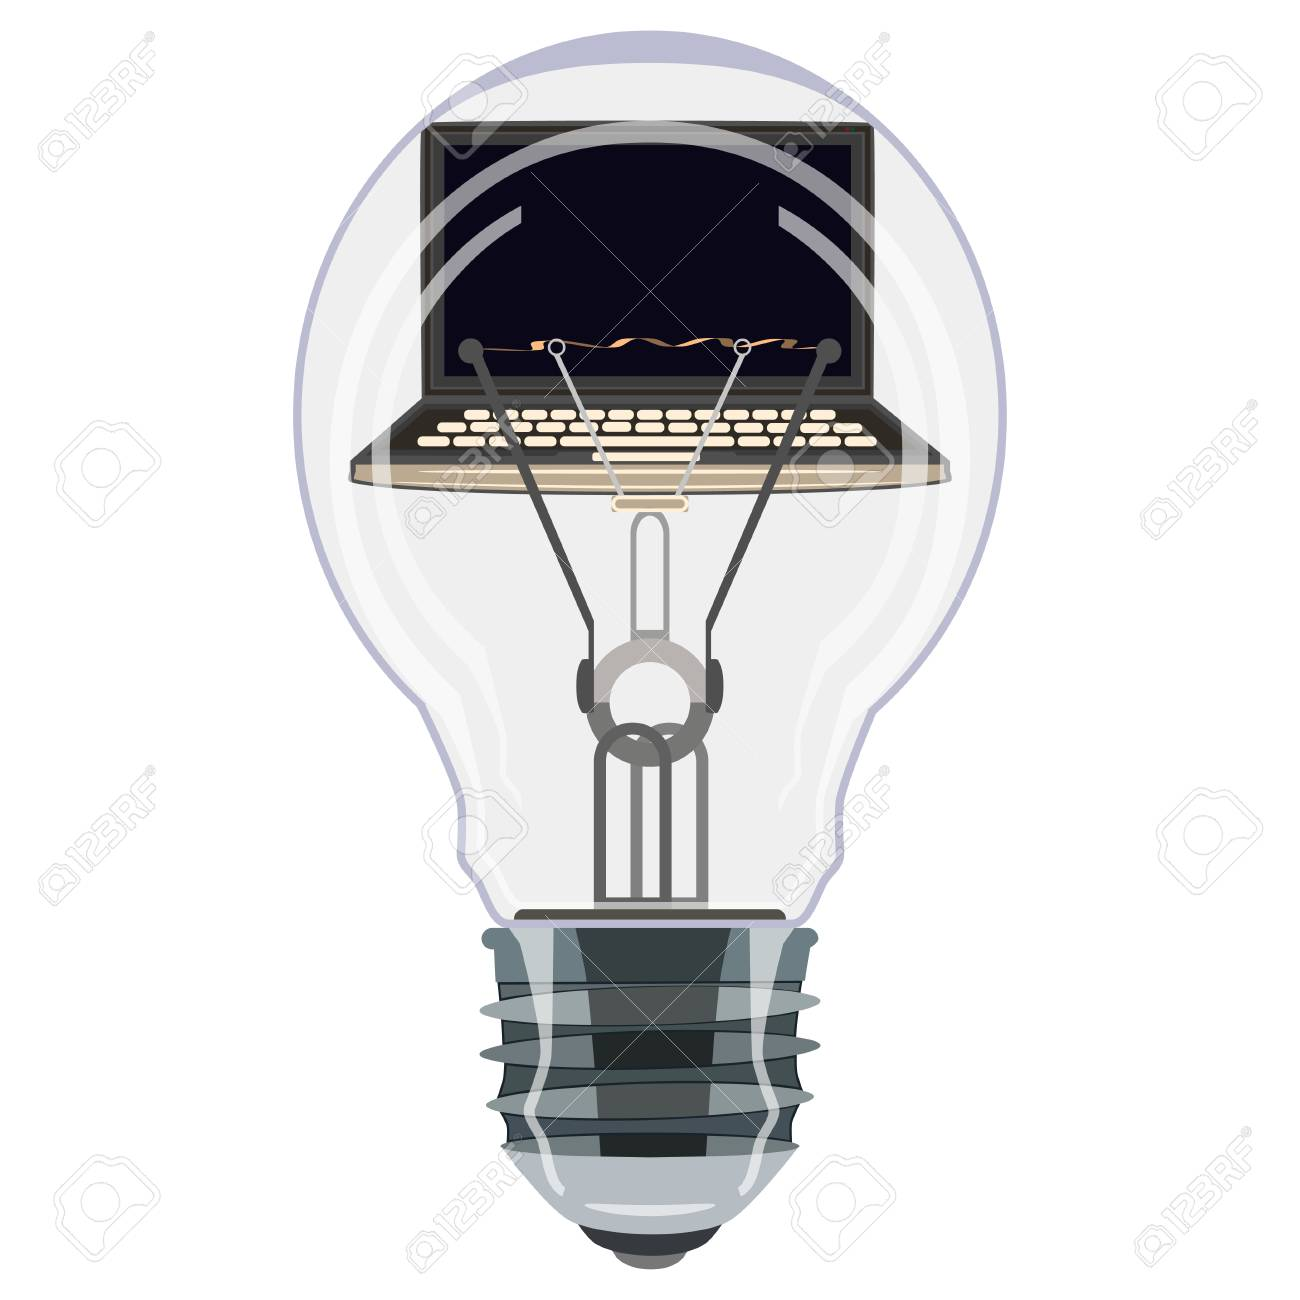 Laptop Inside Of Light Bulb Vector Illustration. Creative Idea, Software  Development, Computer And